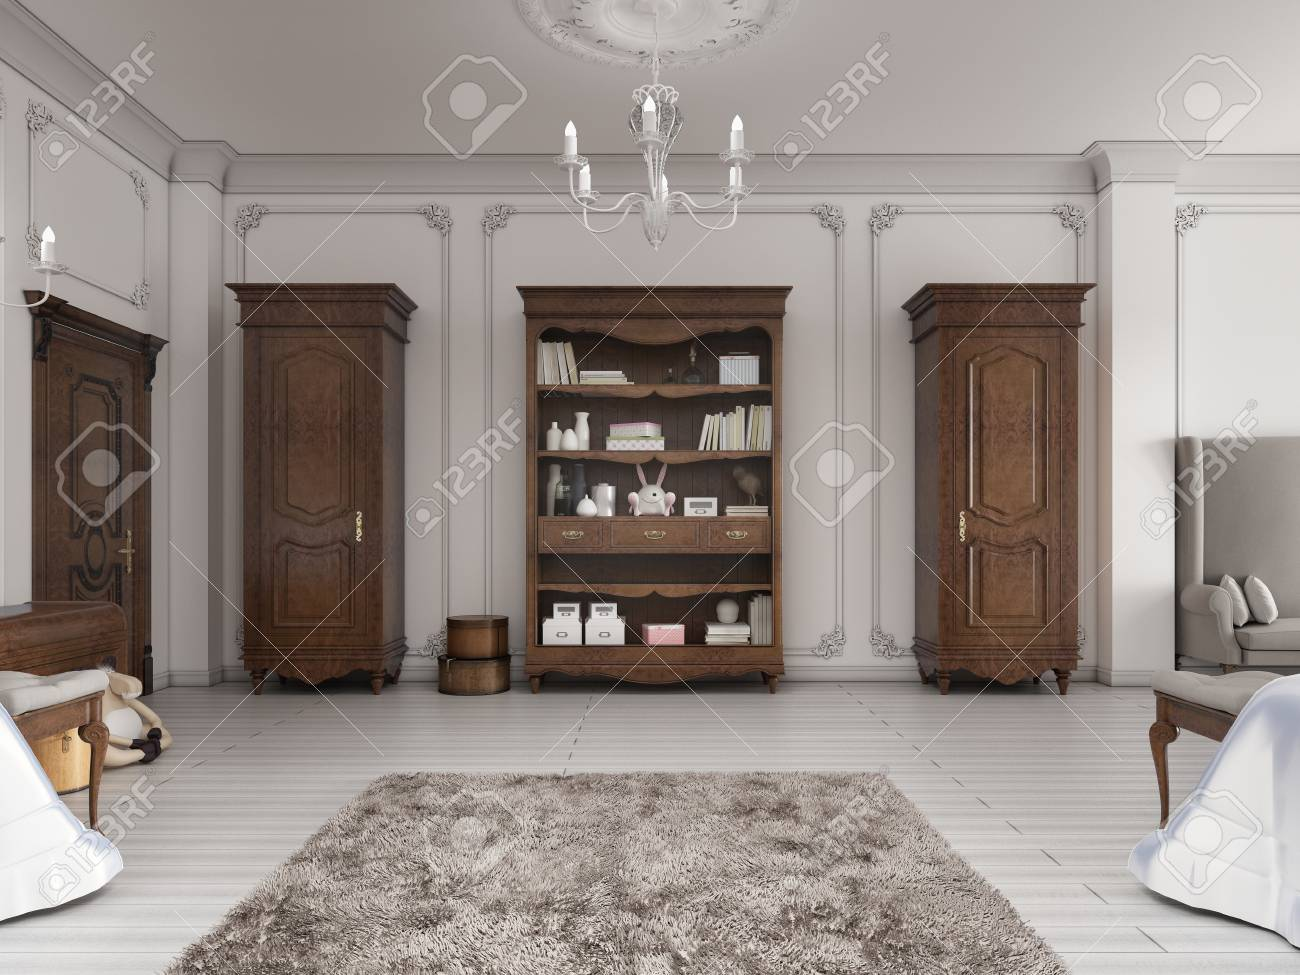 Full Size of Regal Sofa Regale Weiß Kinderzimmer Garderobe Kinderzimmer